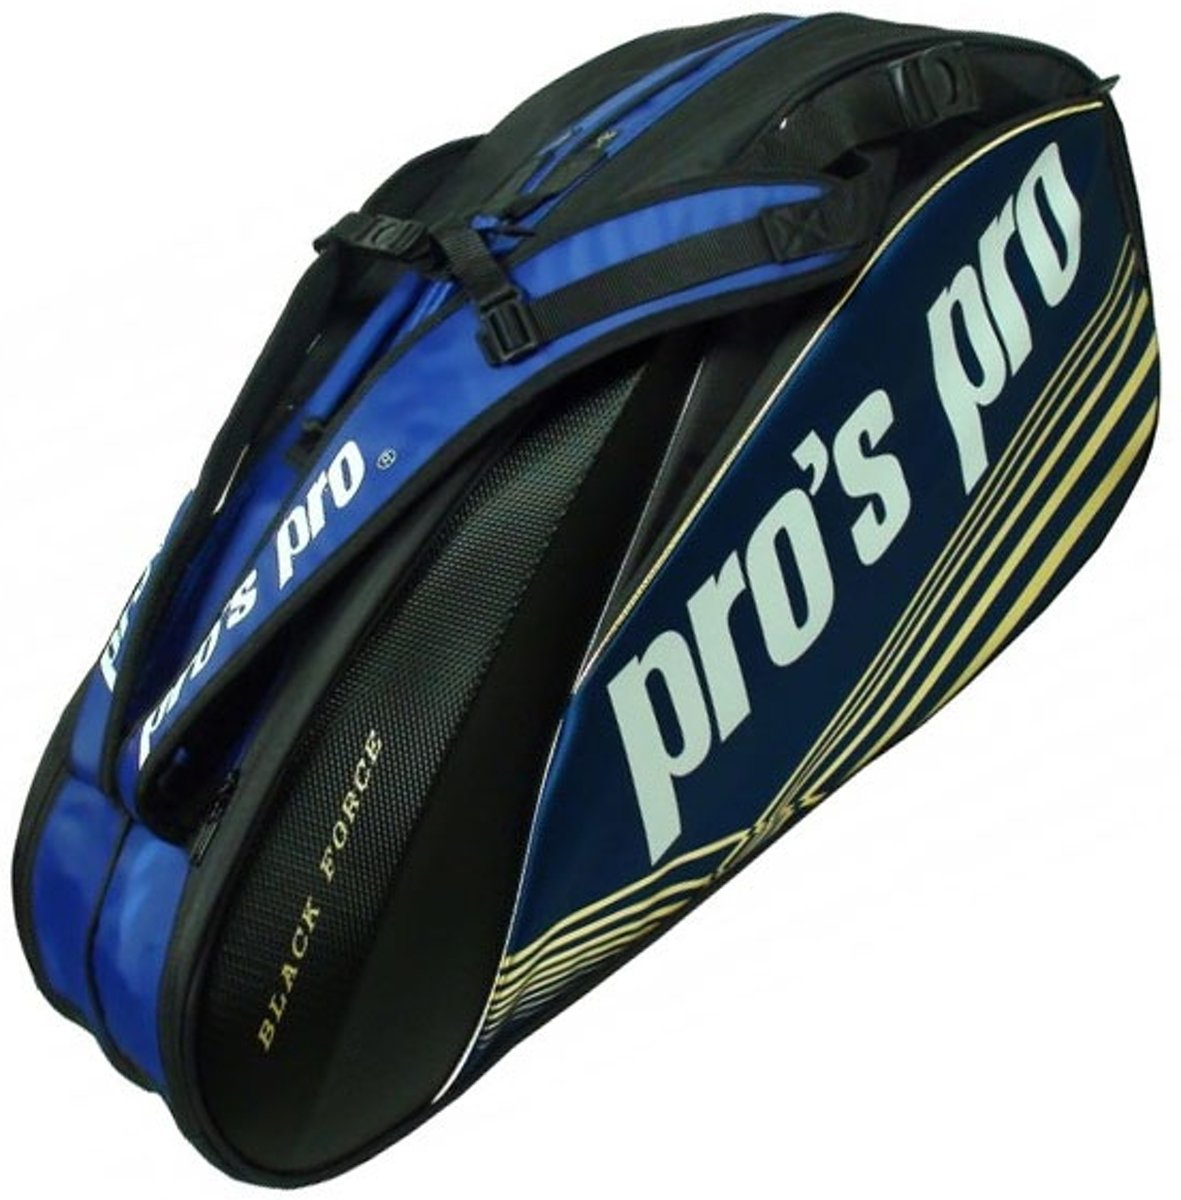 Pro's Pro Racketbag-8 Black Force blauw zwart kopen